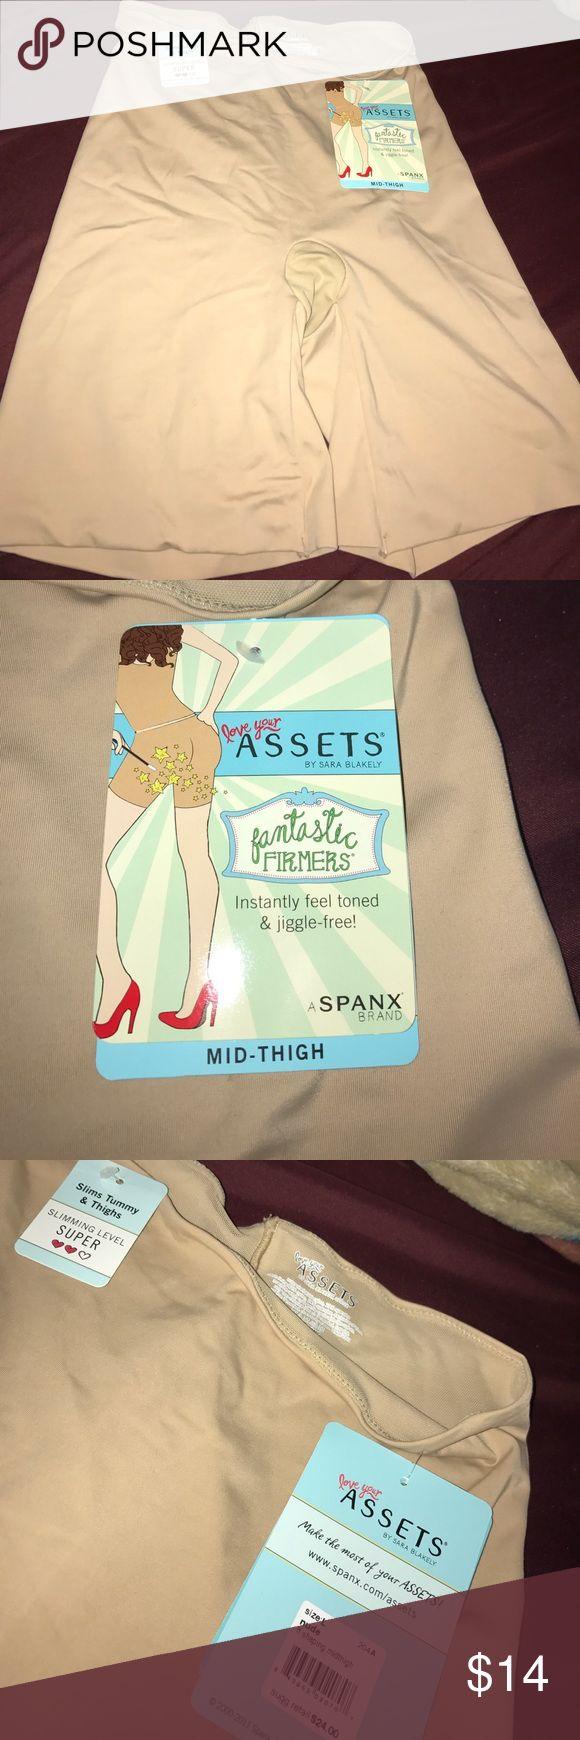 Assets Midthigh Shaper Shaping Spanx shorts. Size Large Assets By Spanx Intimates & Sleepwear Shapewear